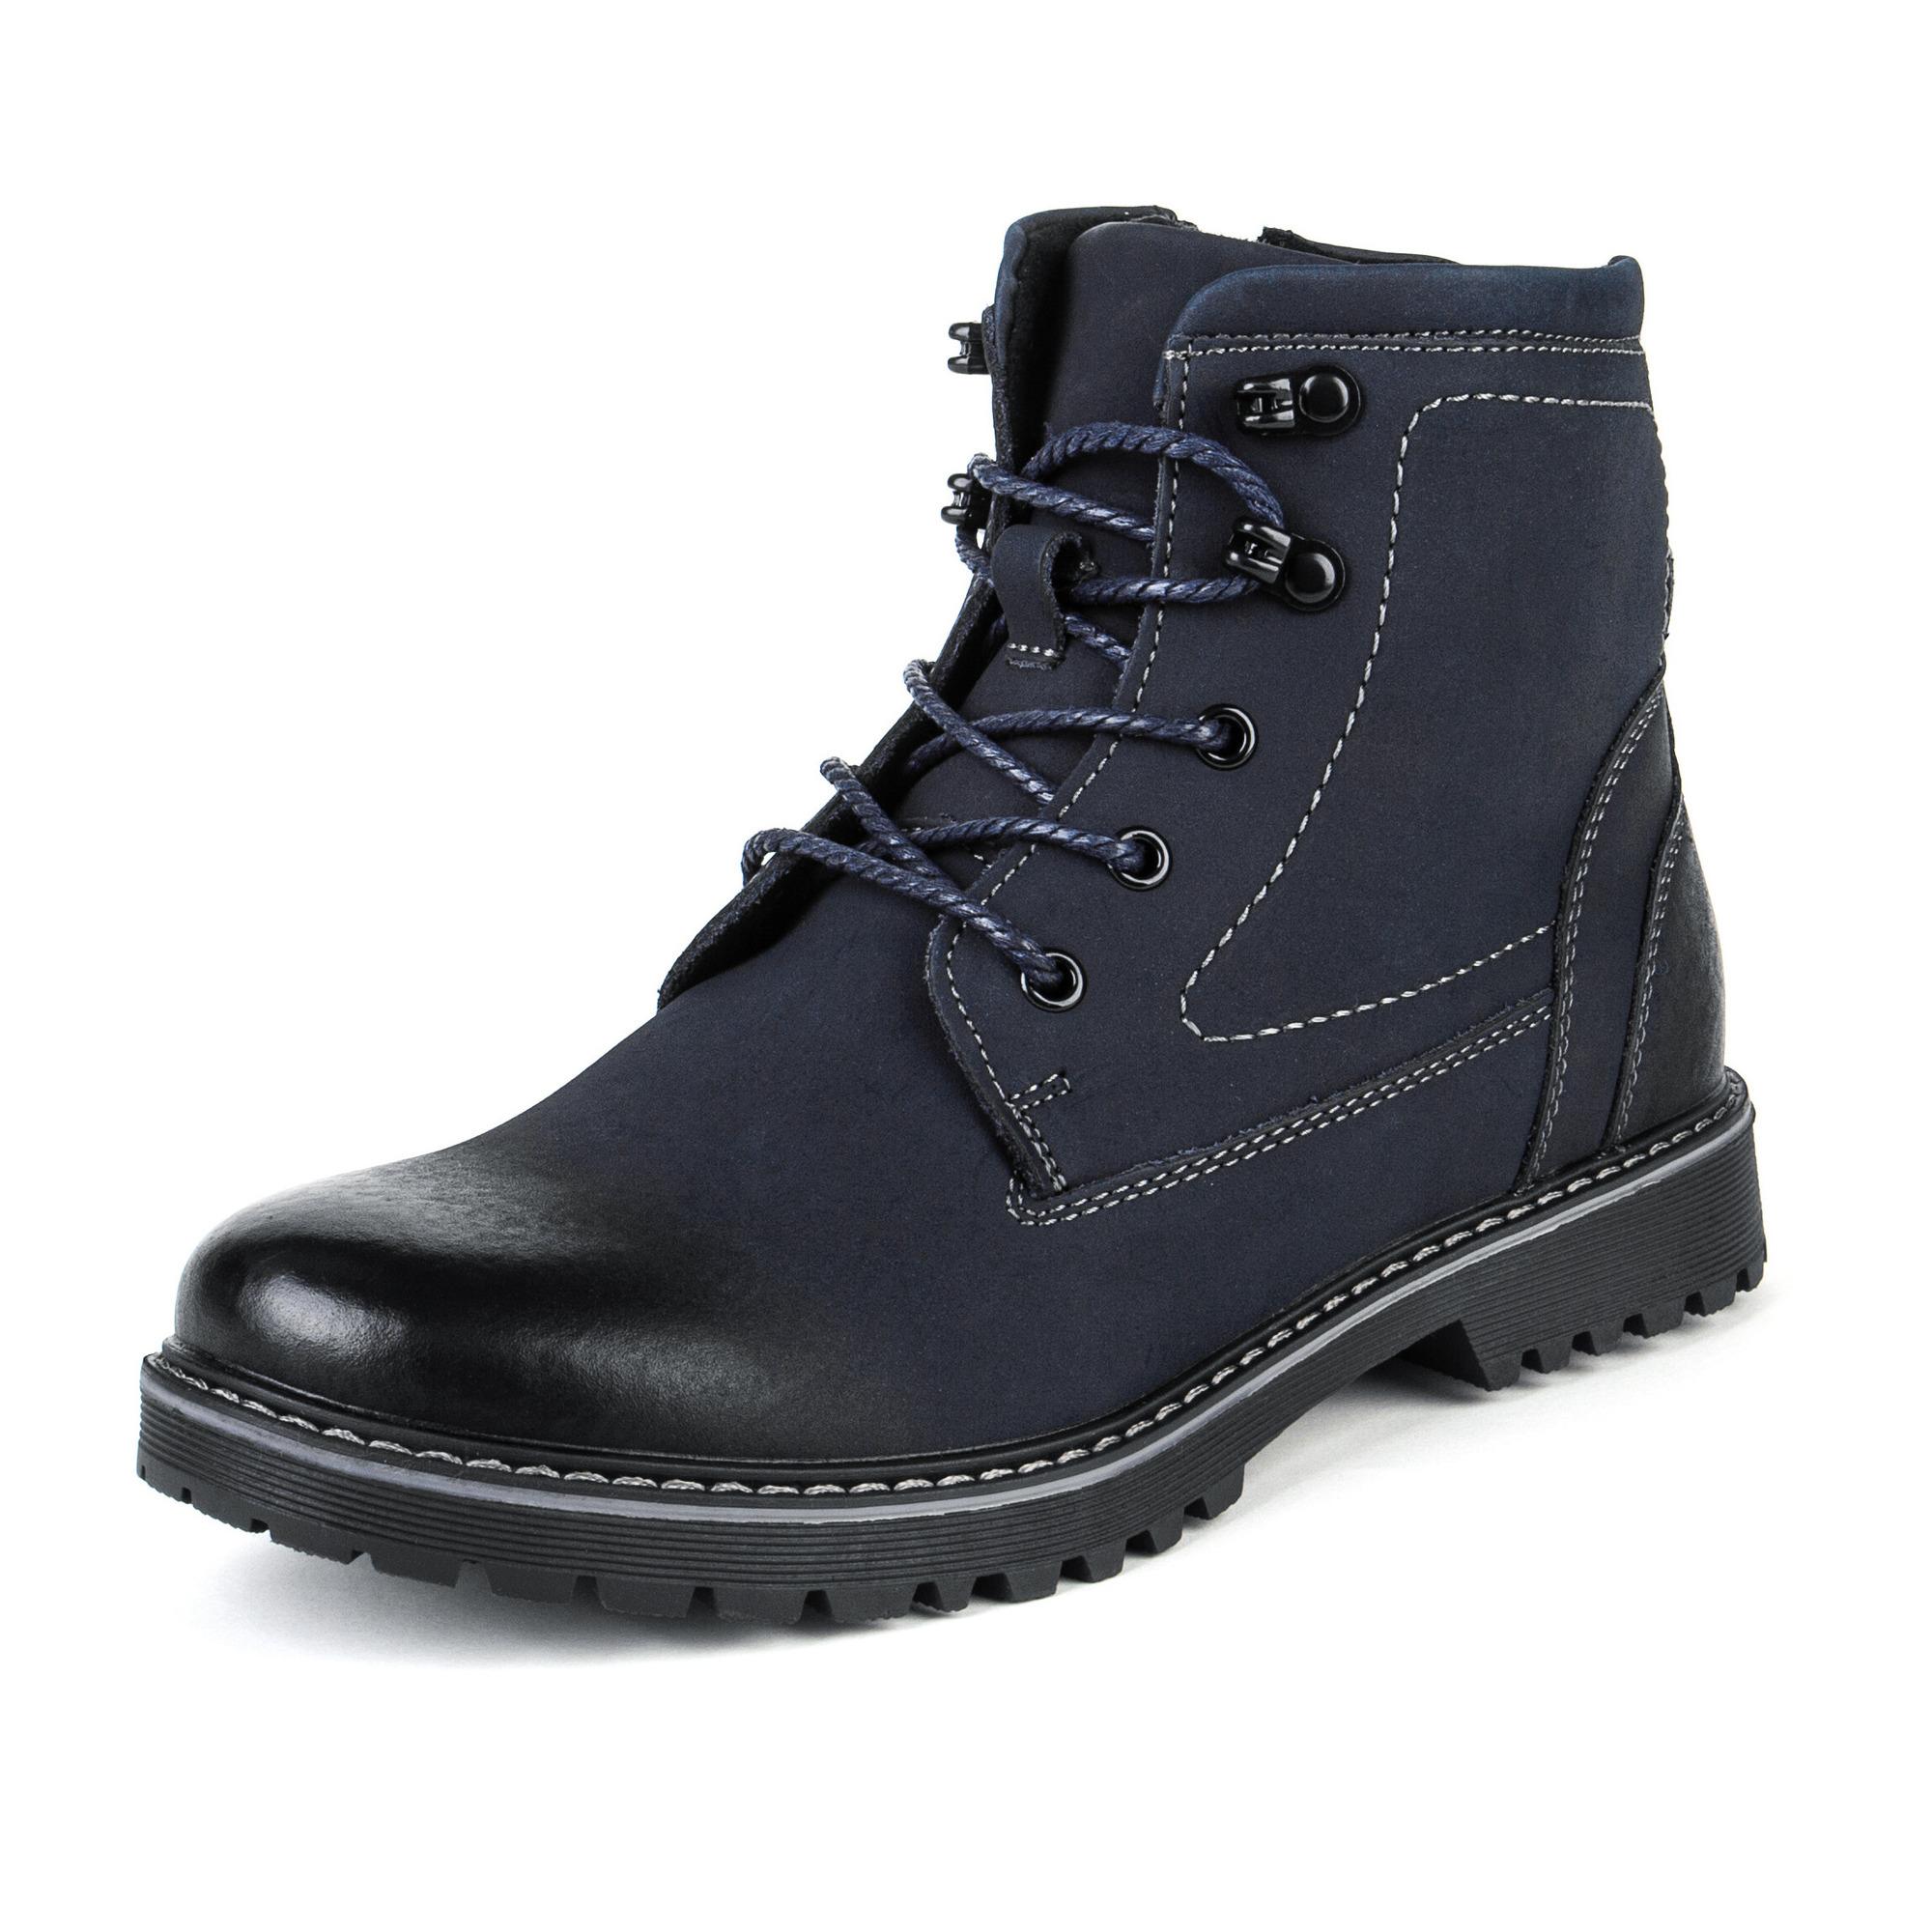 Купить 98-92BO-039VN, Ботинки для мальчиков ZENDEN, цв. синий, р-р 40,